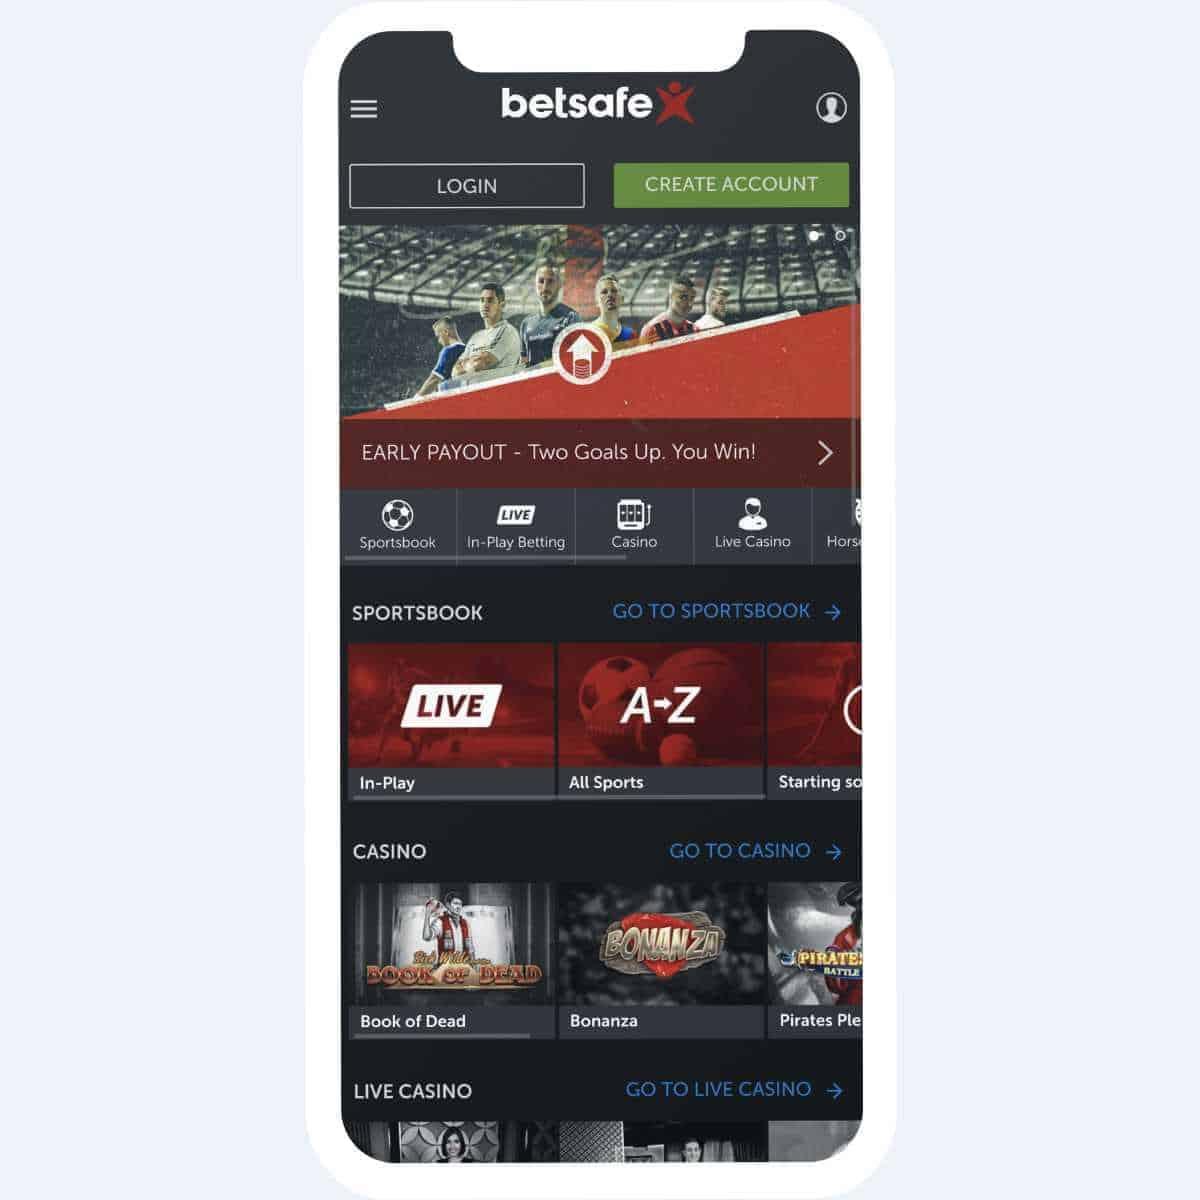 betsafe homepage mobile